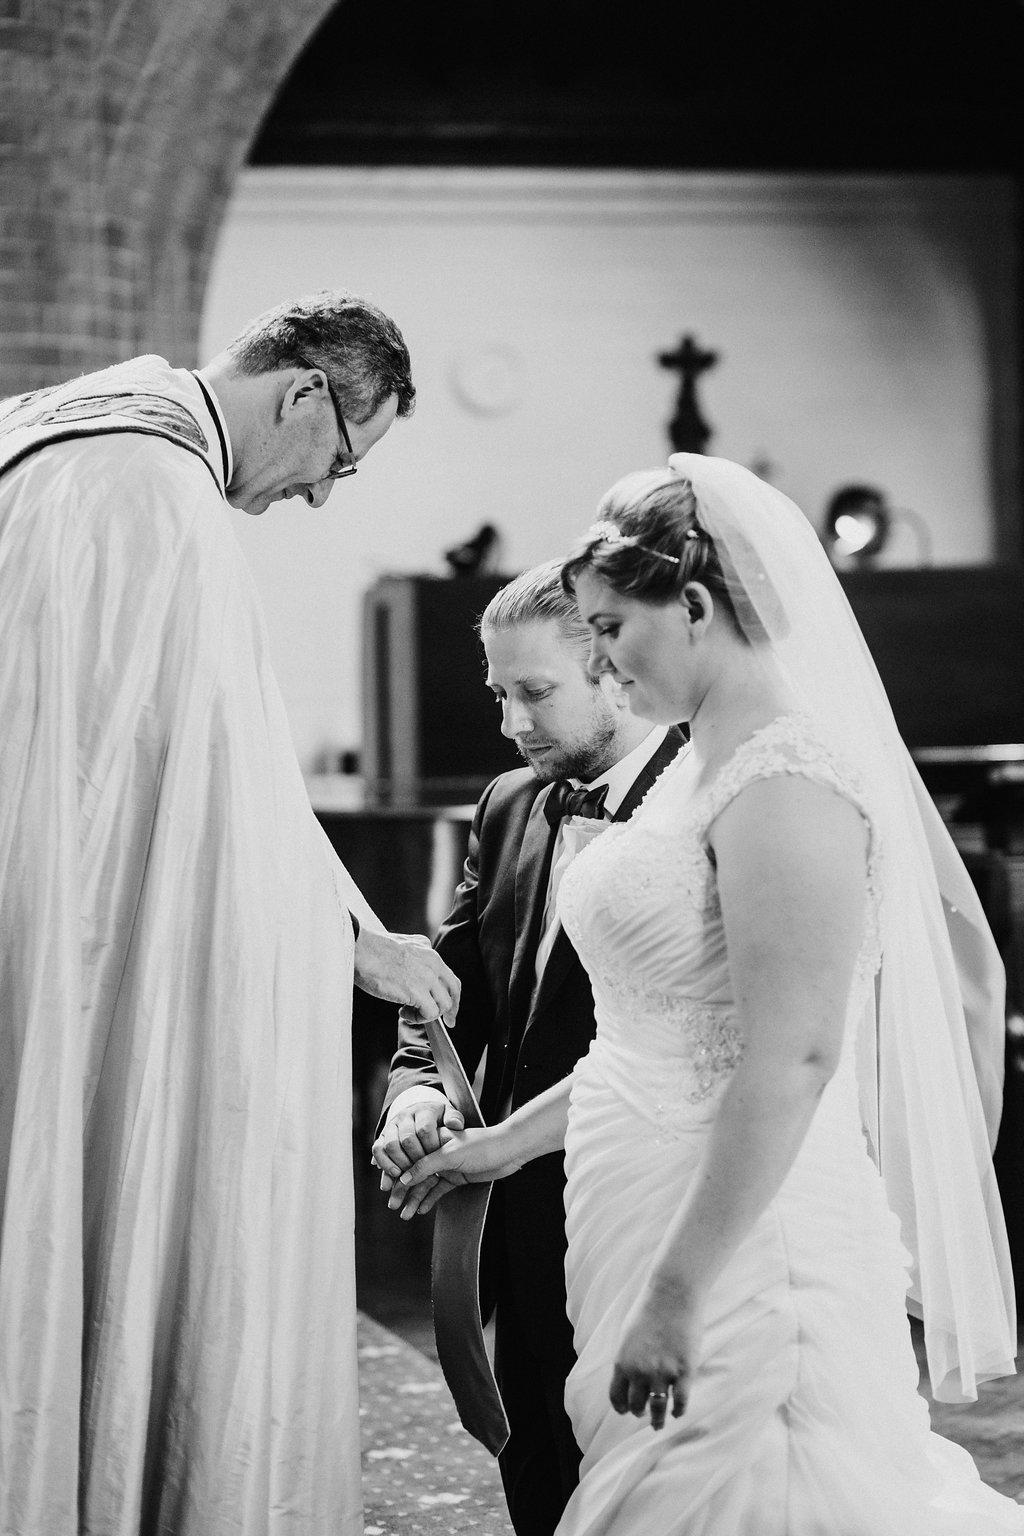 Your_Wedding_Day_0150.jpg